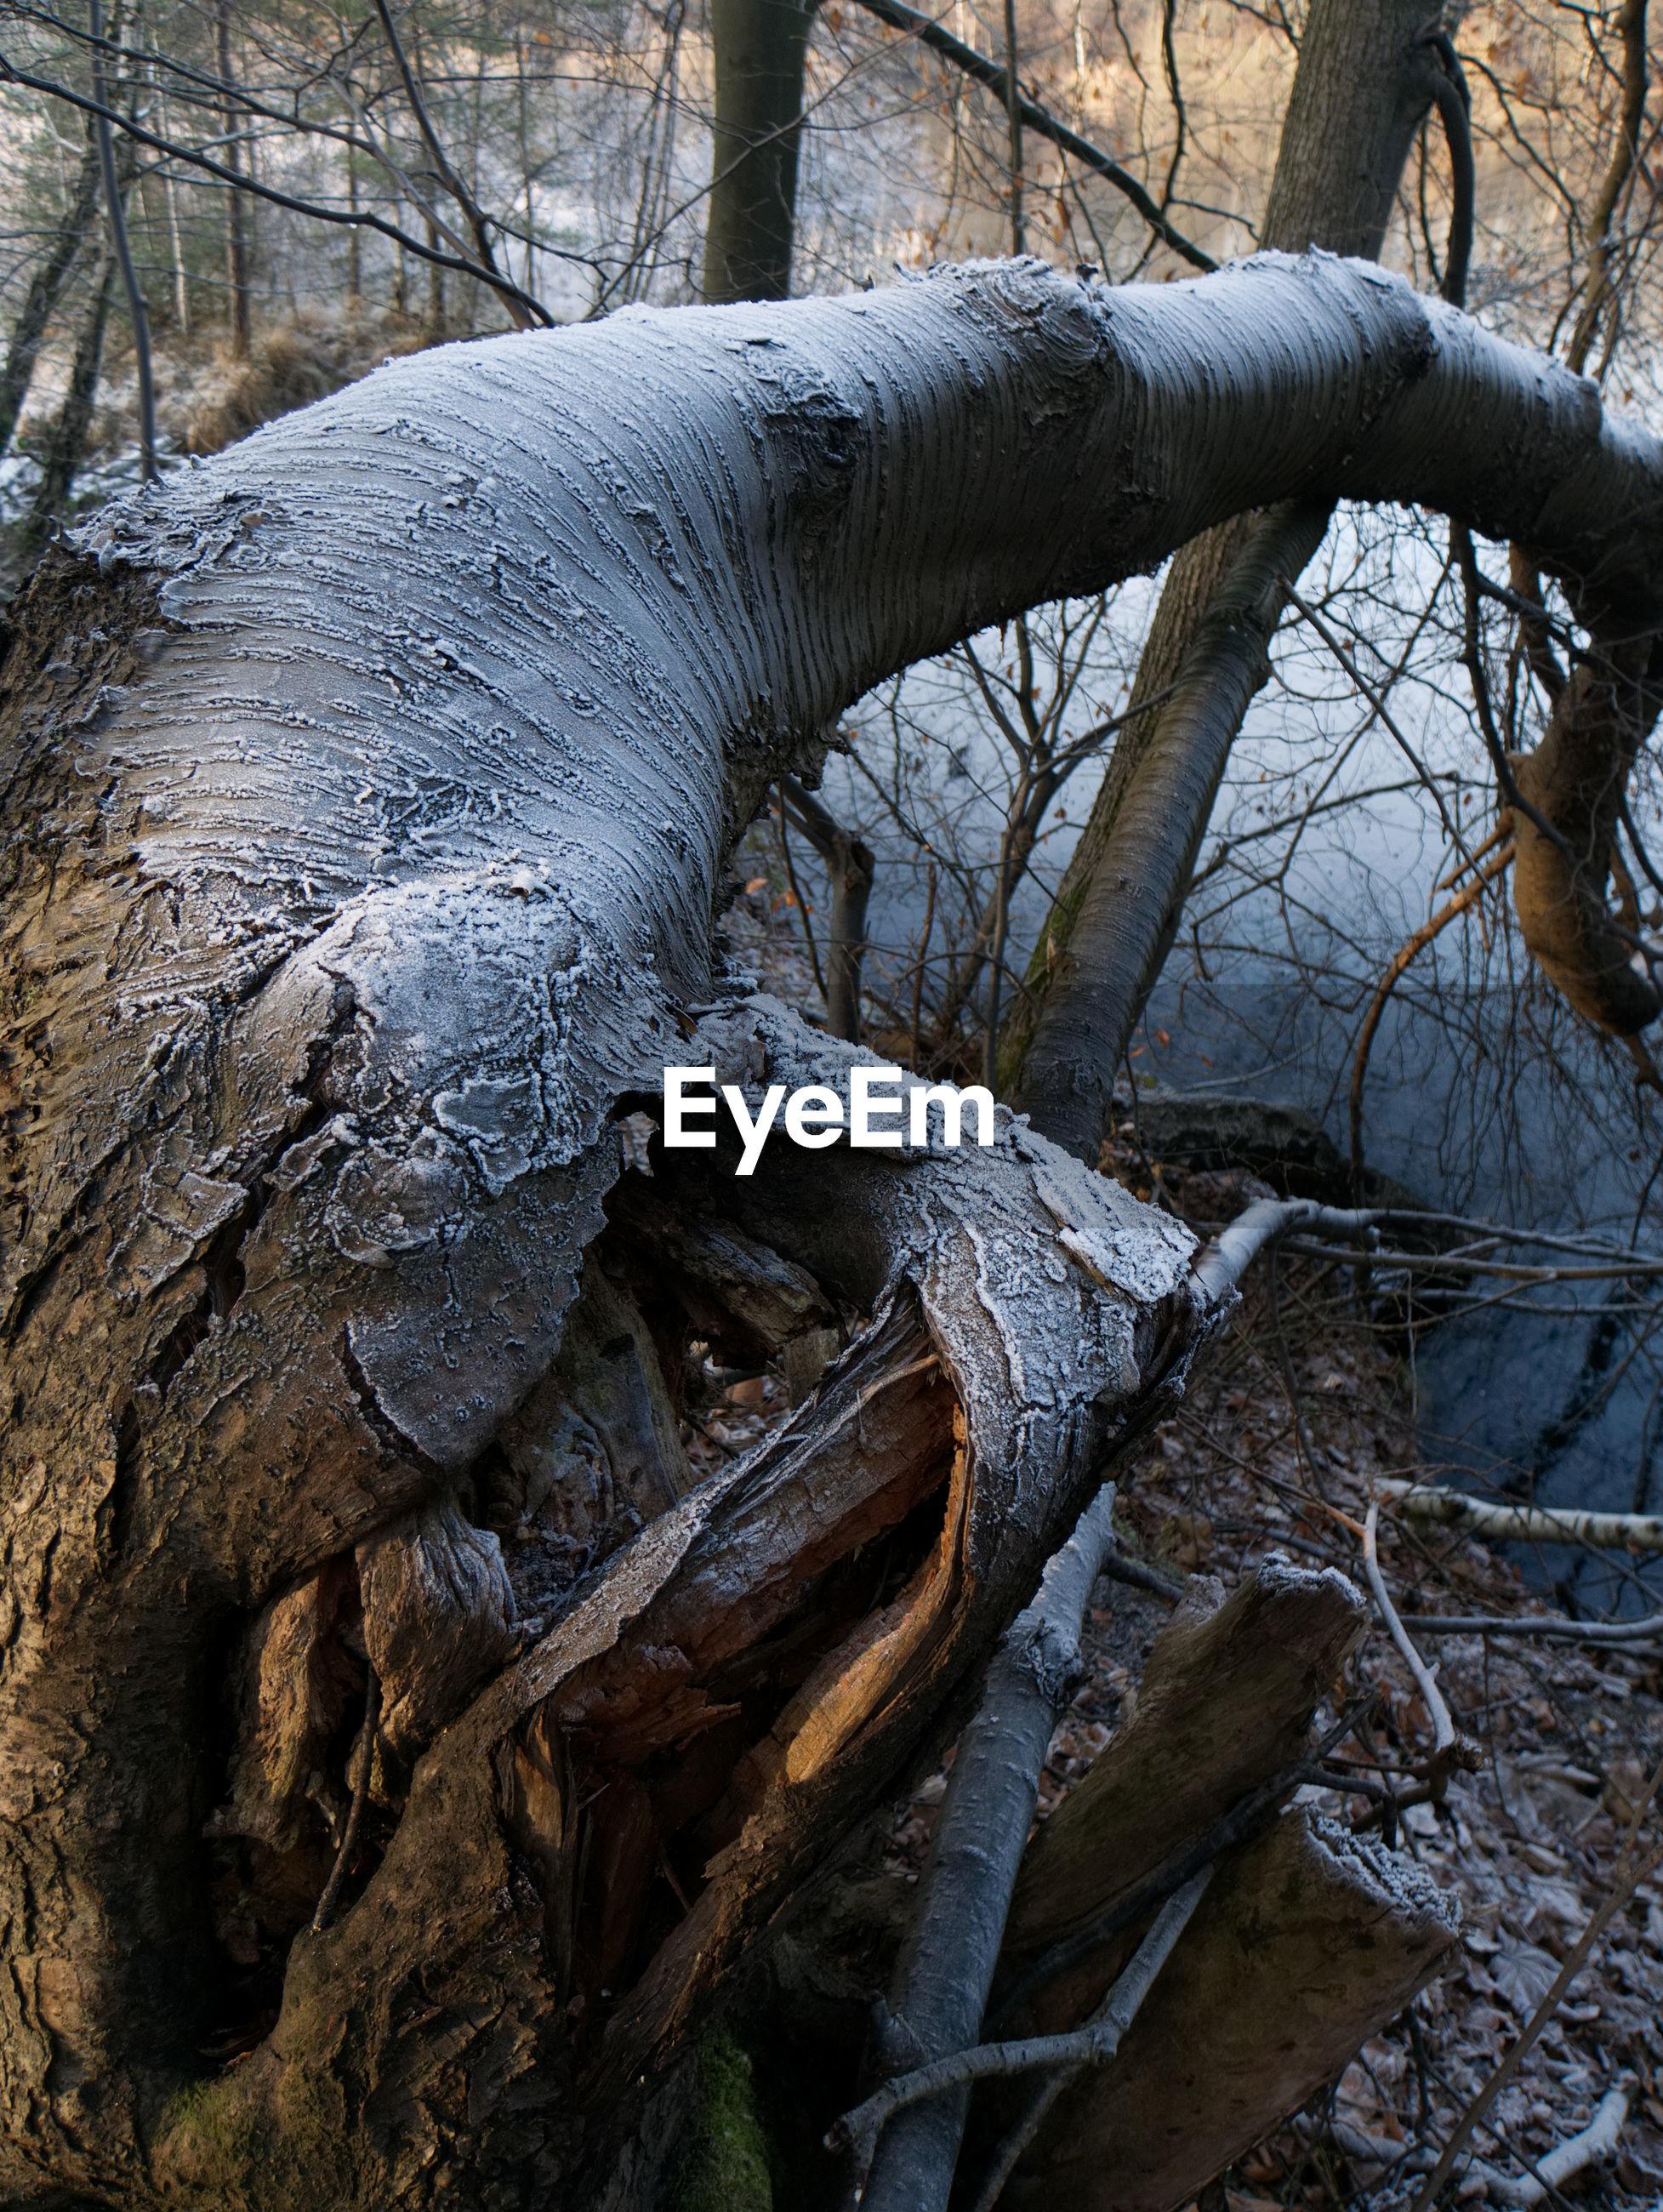 CLOSE-UP OF BARE TREE